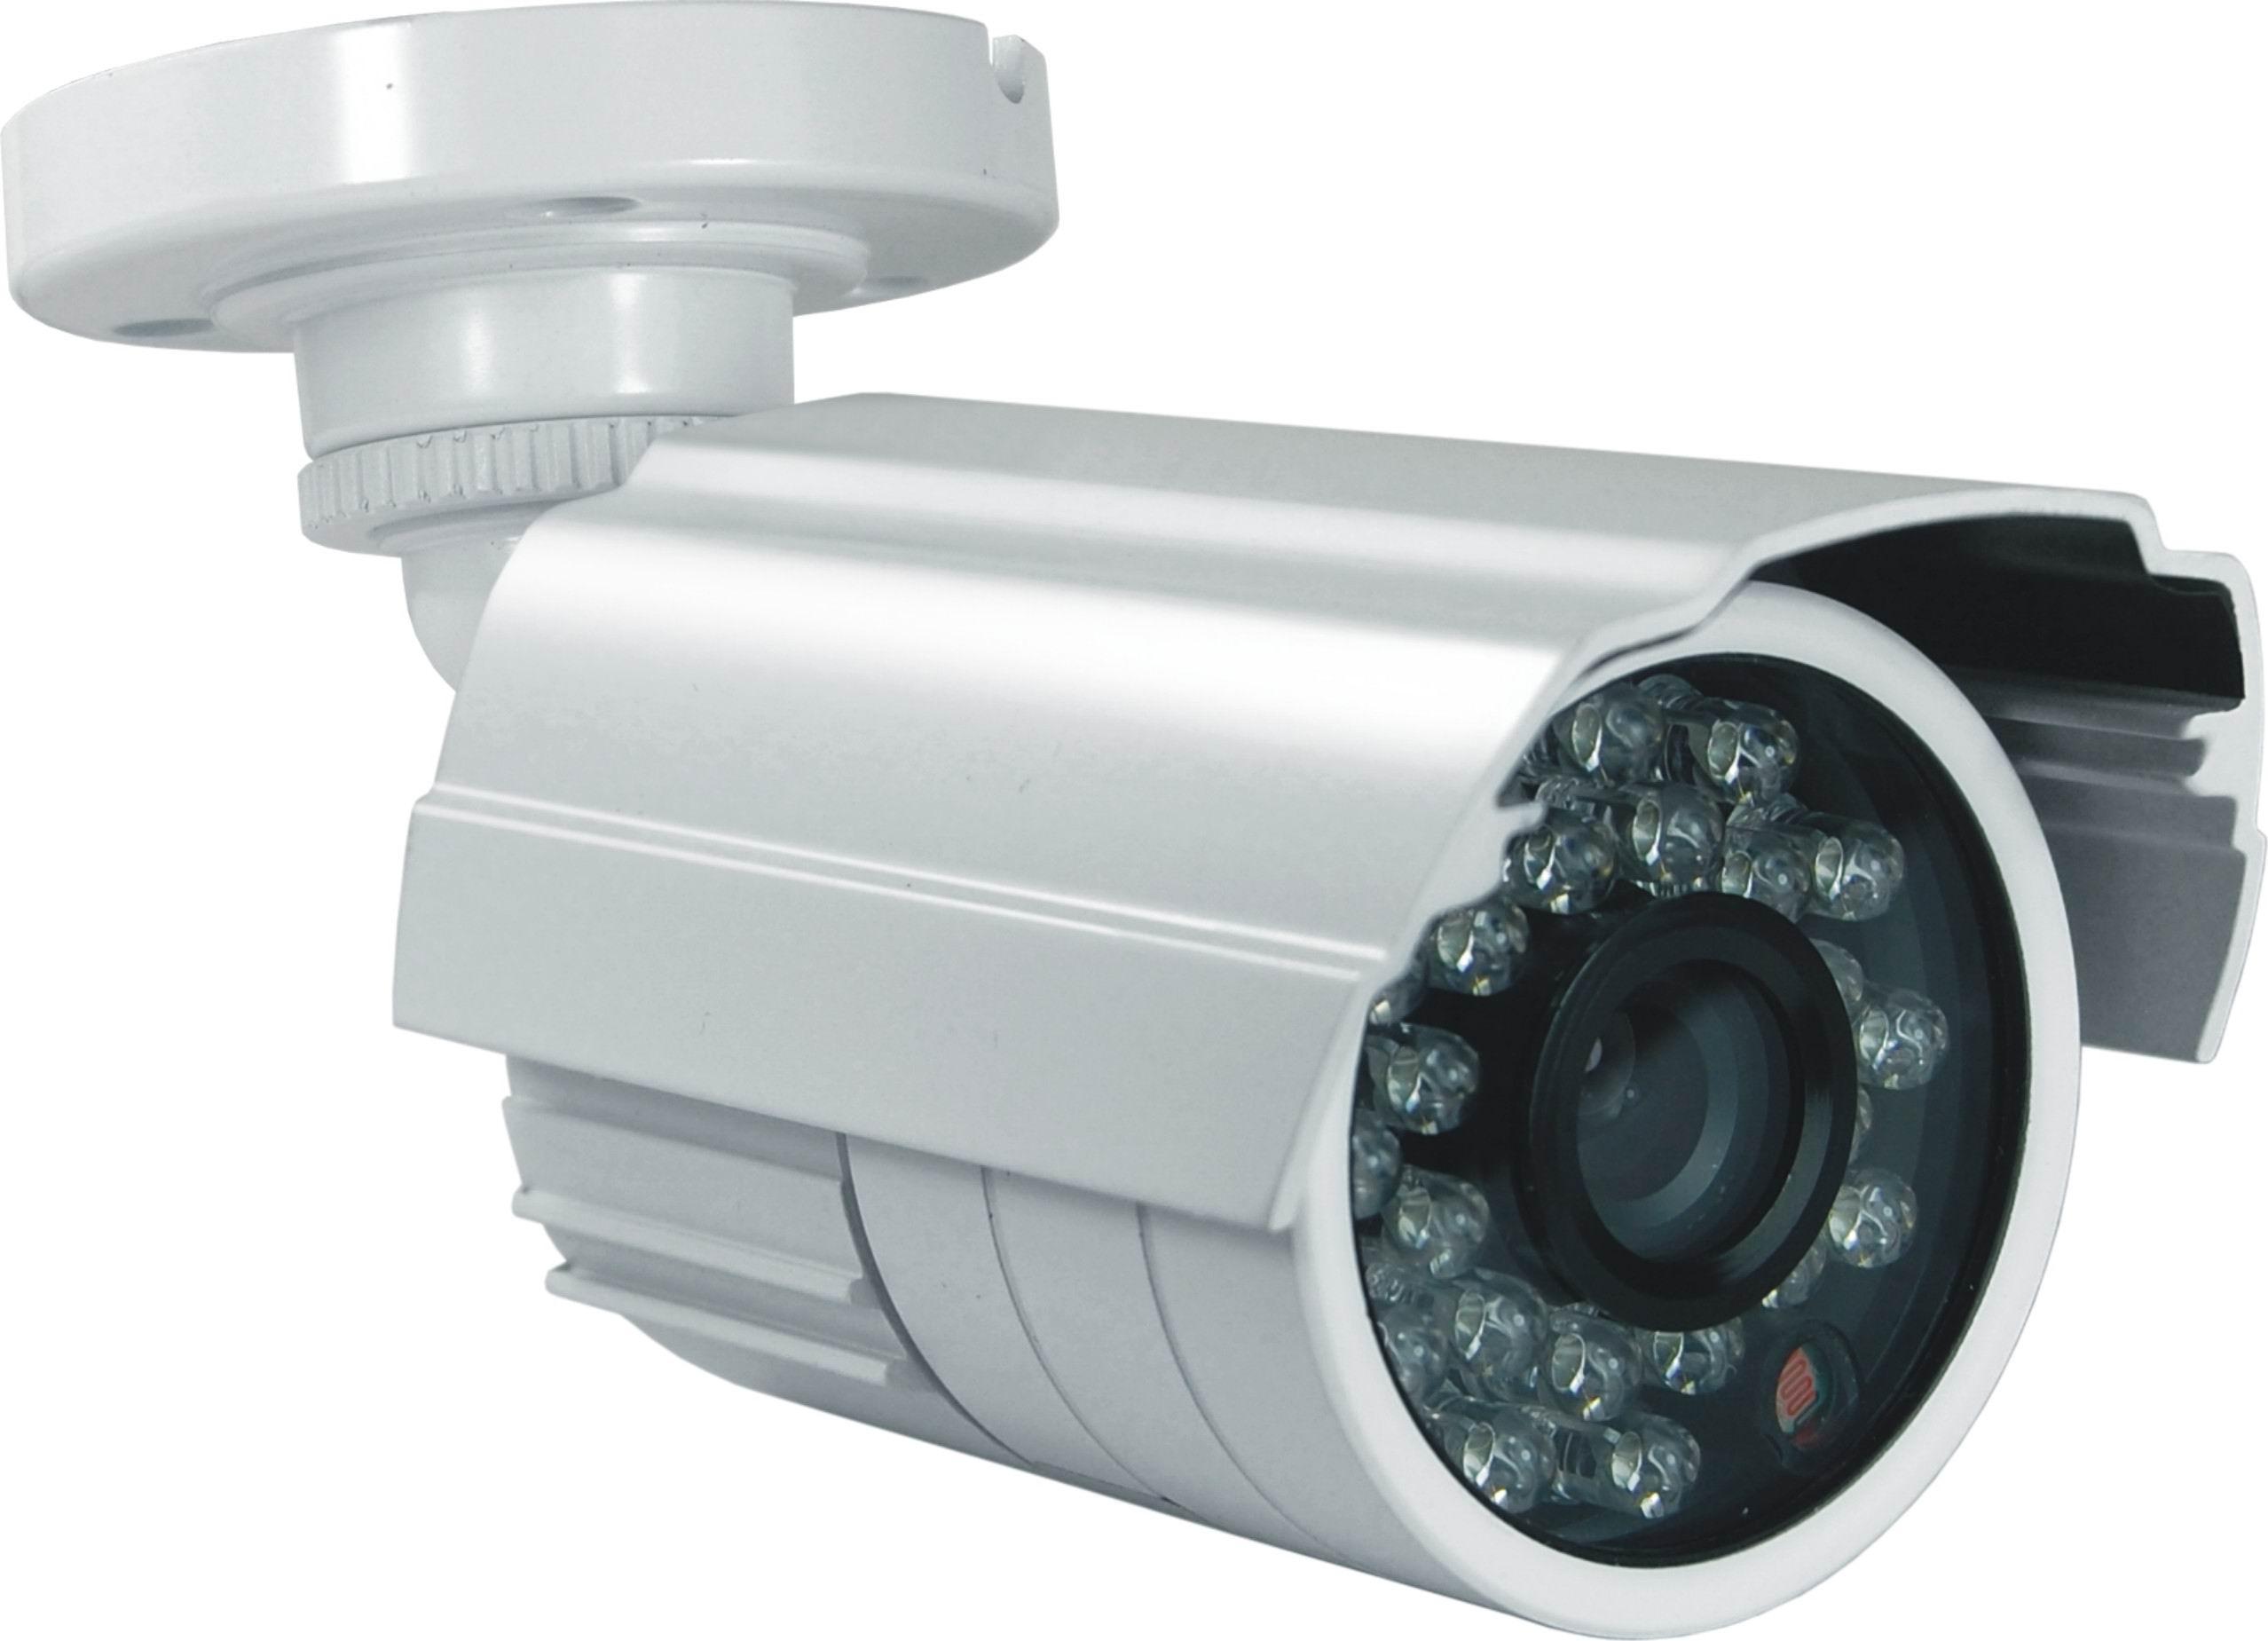 Cctv Camera Images PNG - 139190